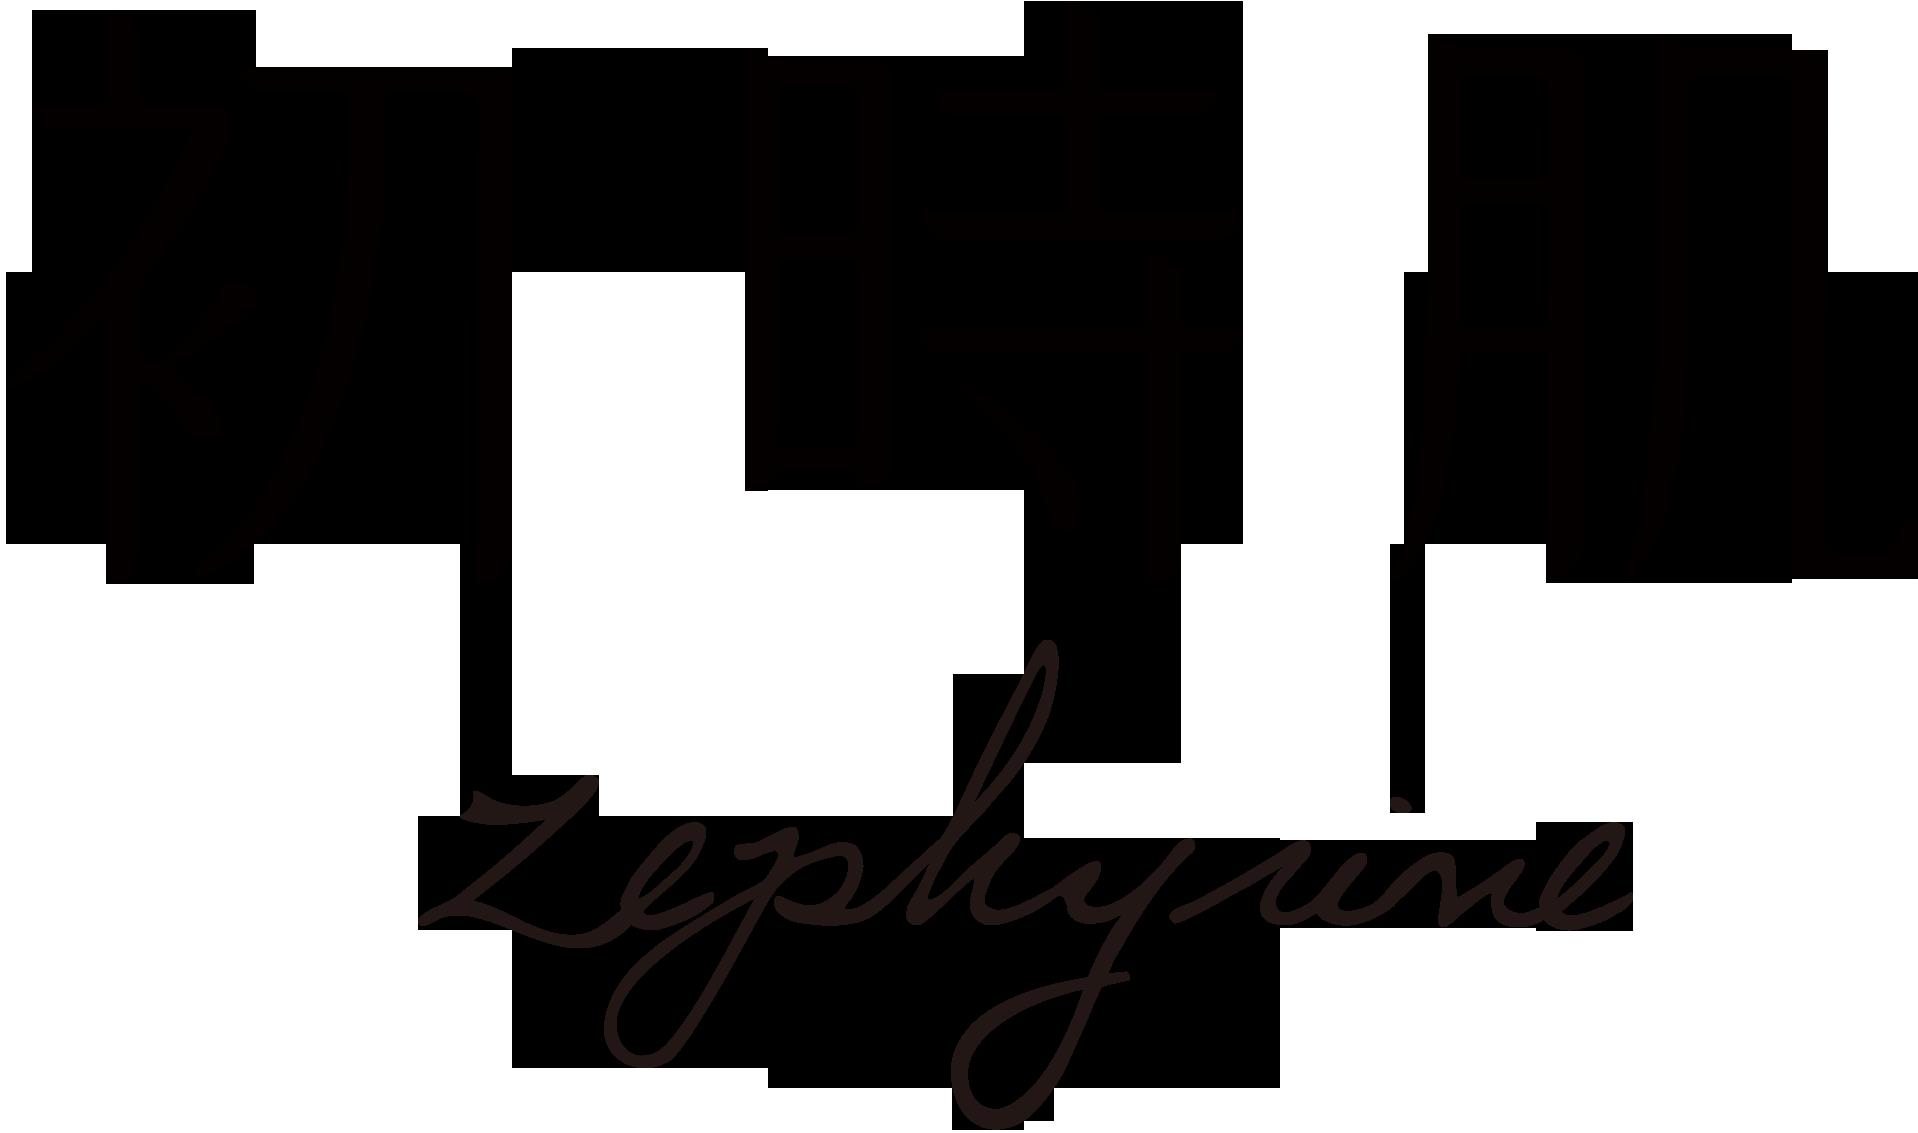 初時肌 Zephyrine